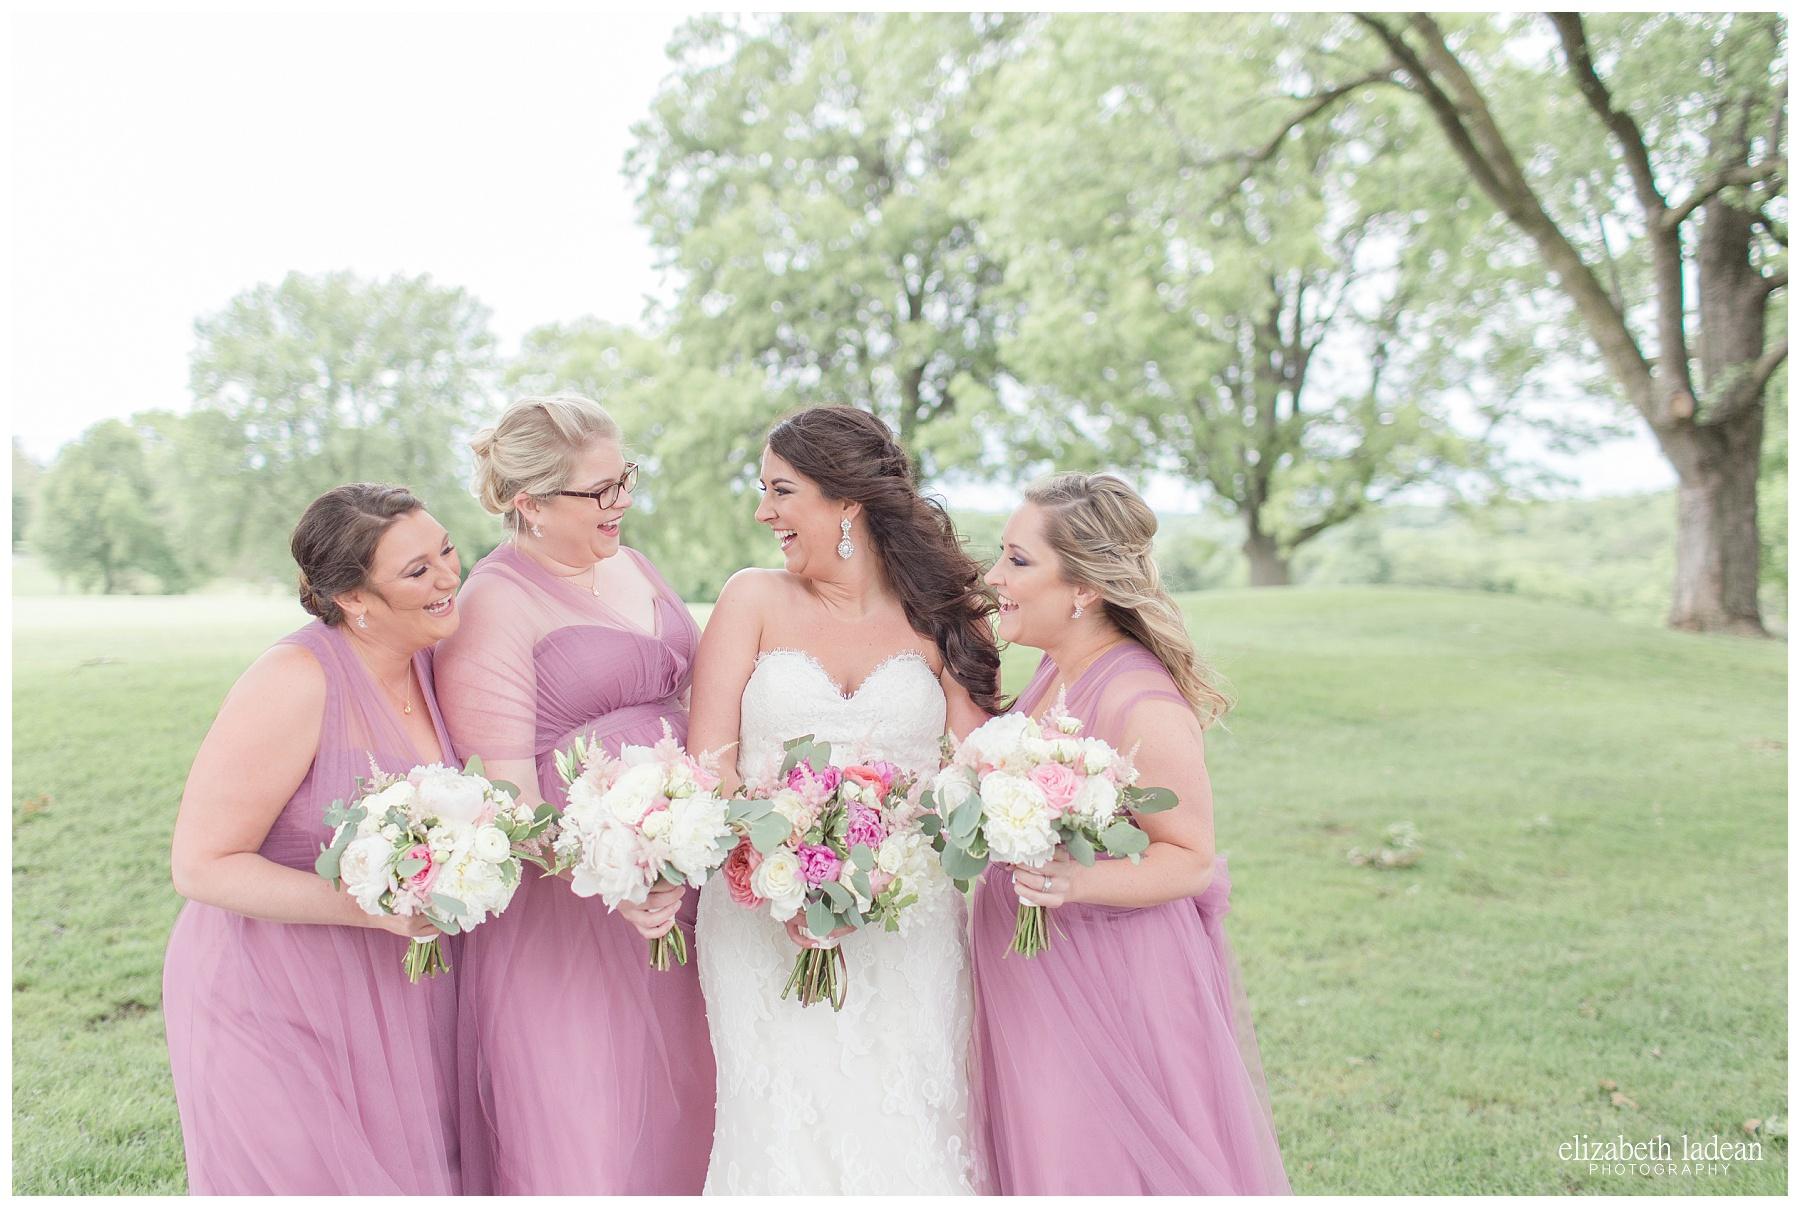 Hillcrest-Country-Club-Kansas-City-Wedding-Photography-E+J-0520-Elizabeth-Ladean-Photography-photo_0831.jpg